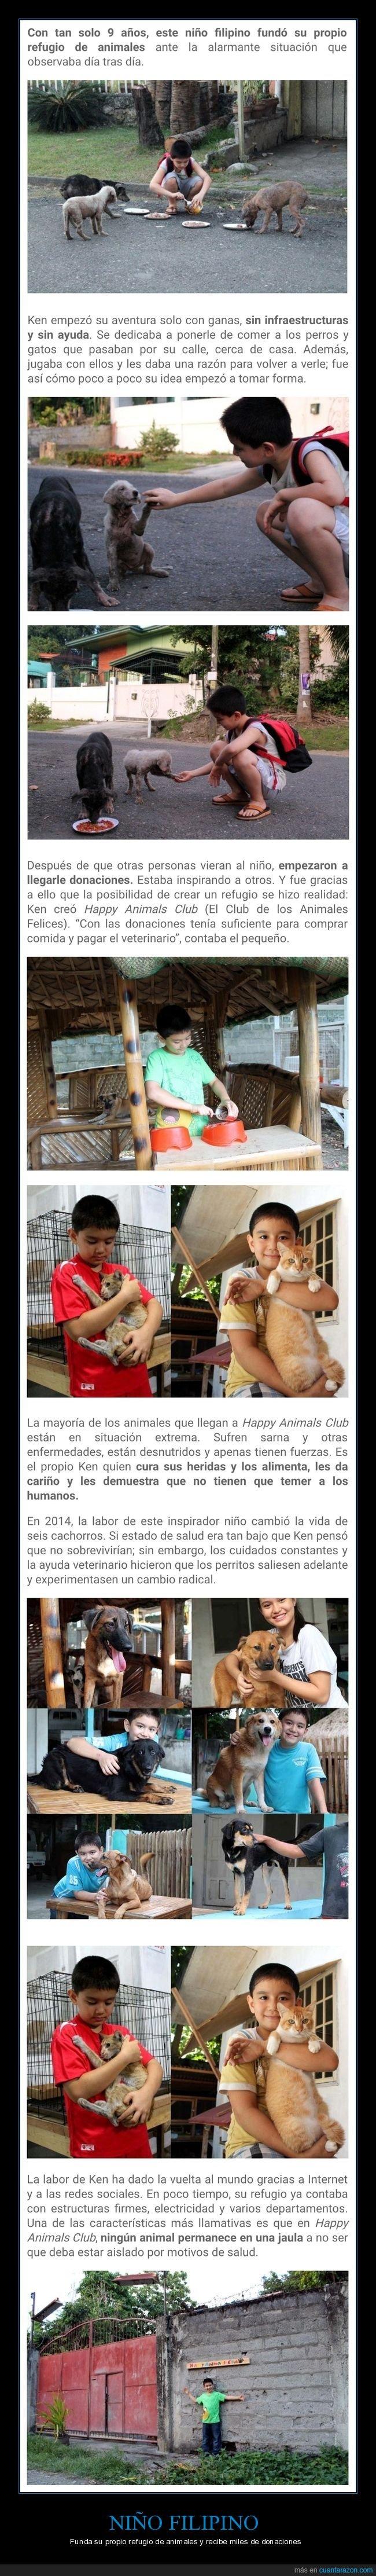 animales,donaciones,filipino,niño,refugio